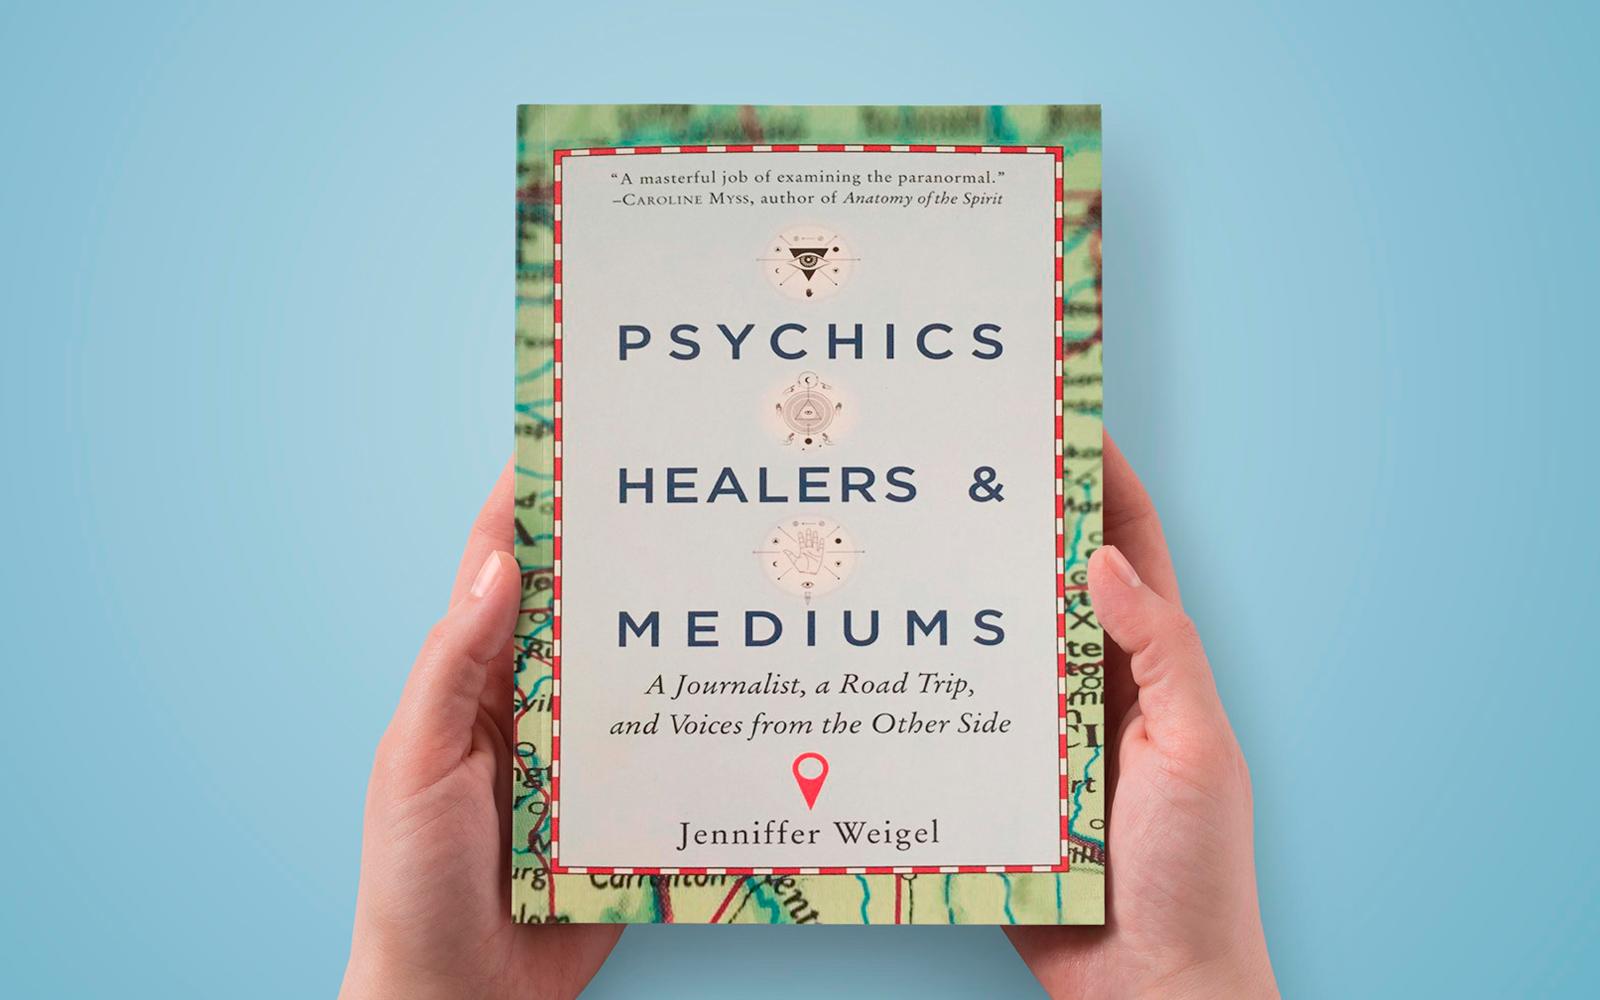 Psychics, Healers & Mediums